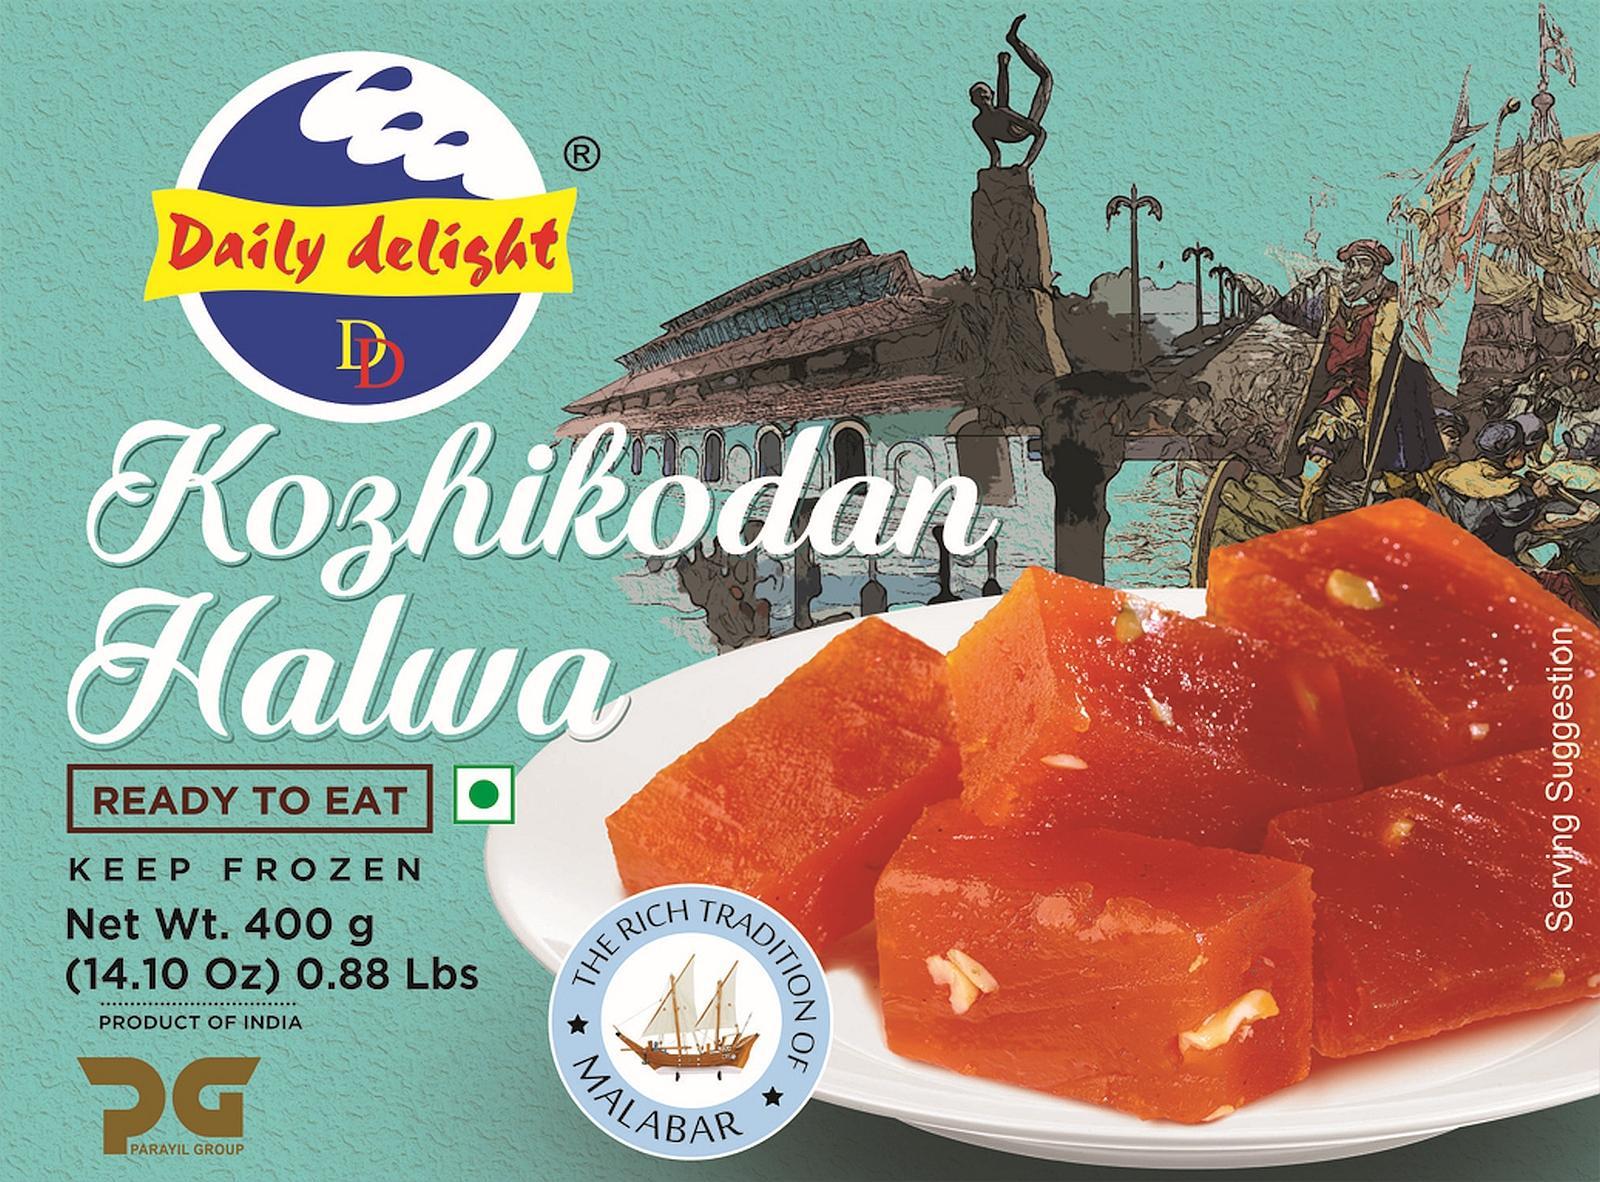 Daily Delight Halwa Kozhikodan